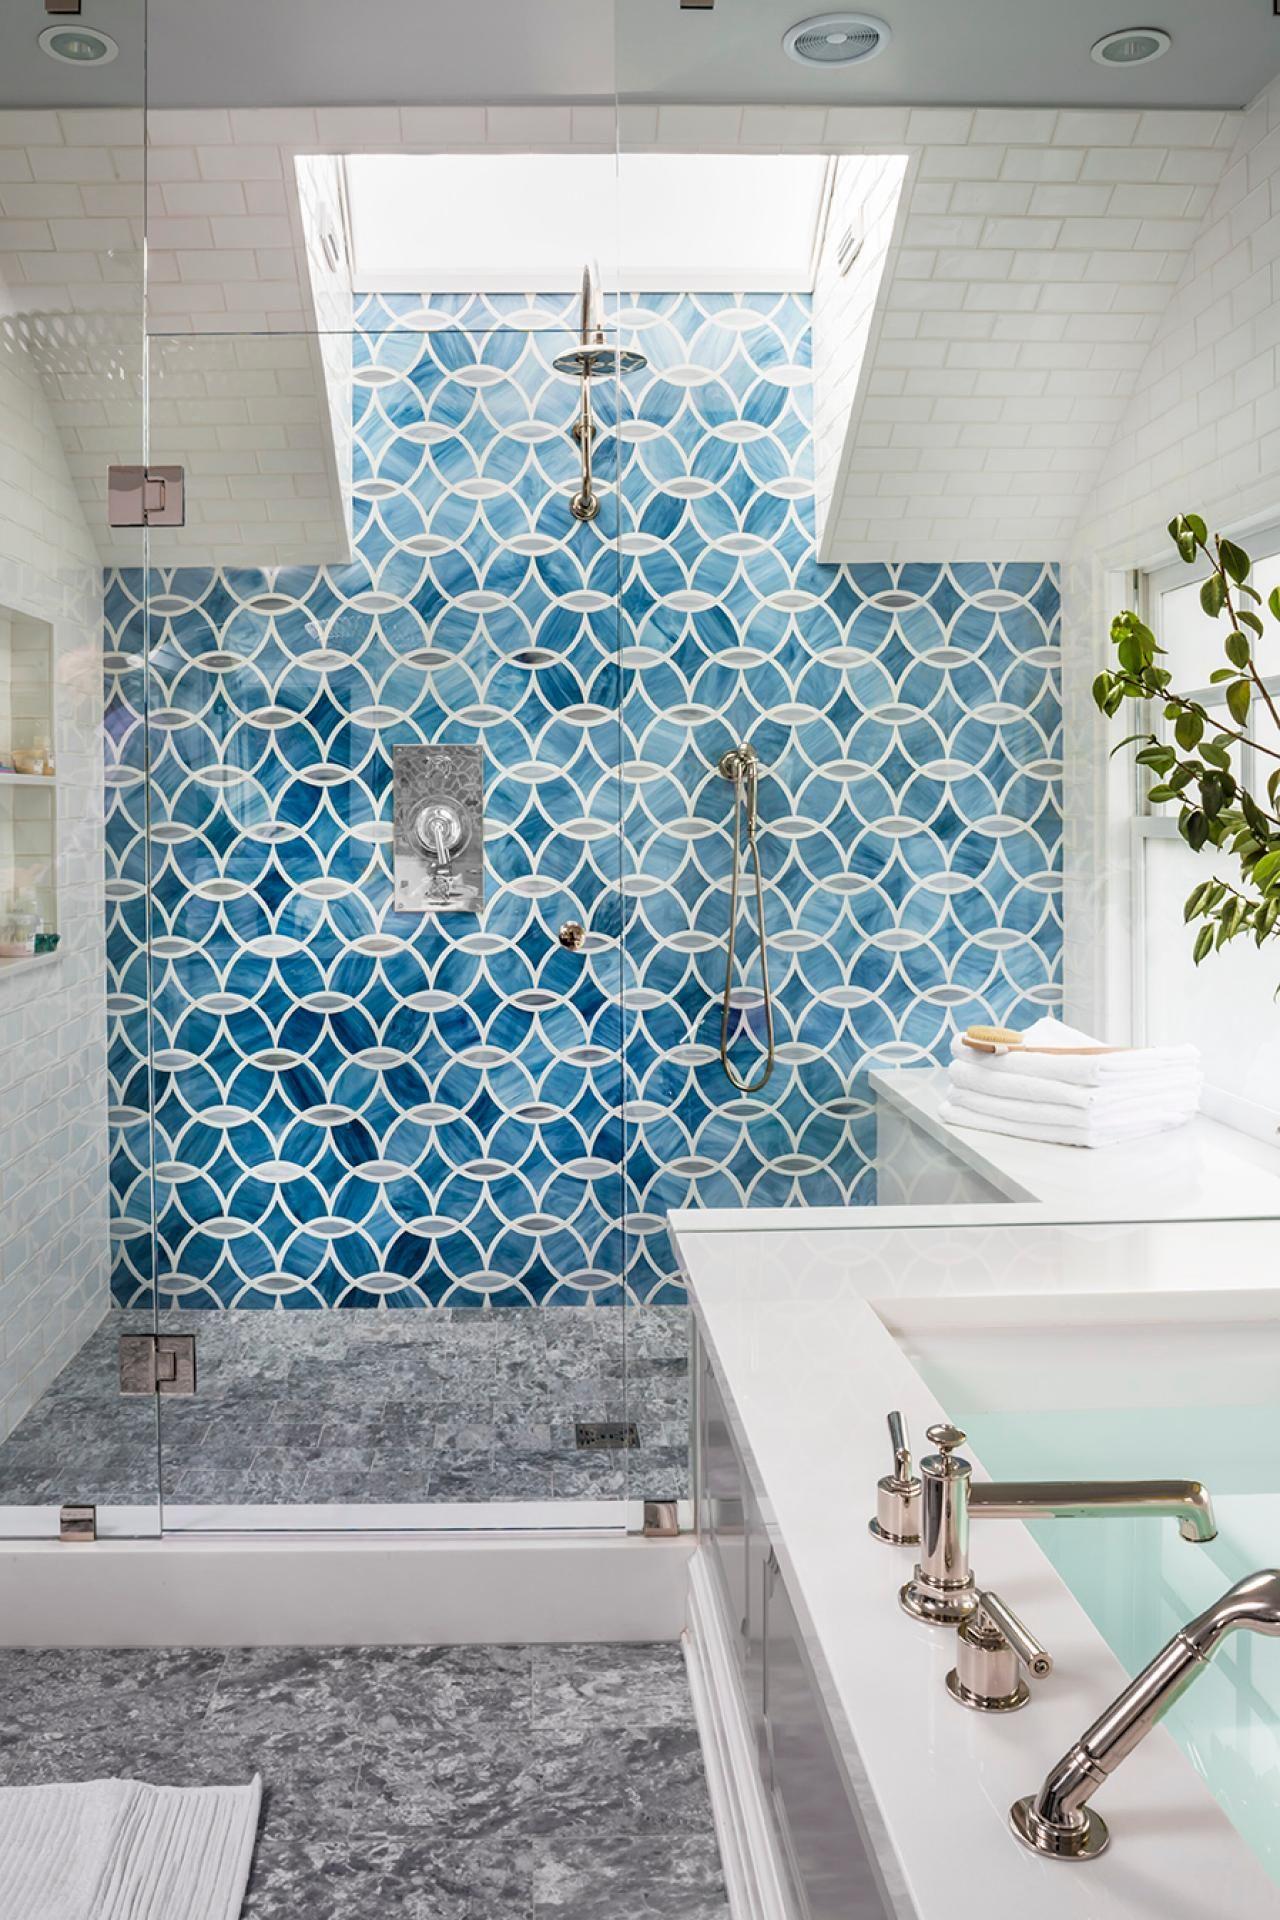 18 zeitgenössische Badezimmer-Bodenbelag-Ideen | Pinterest | Hgtv ...